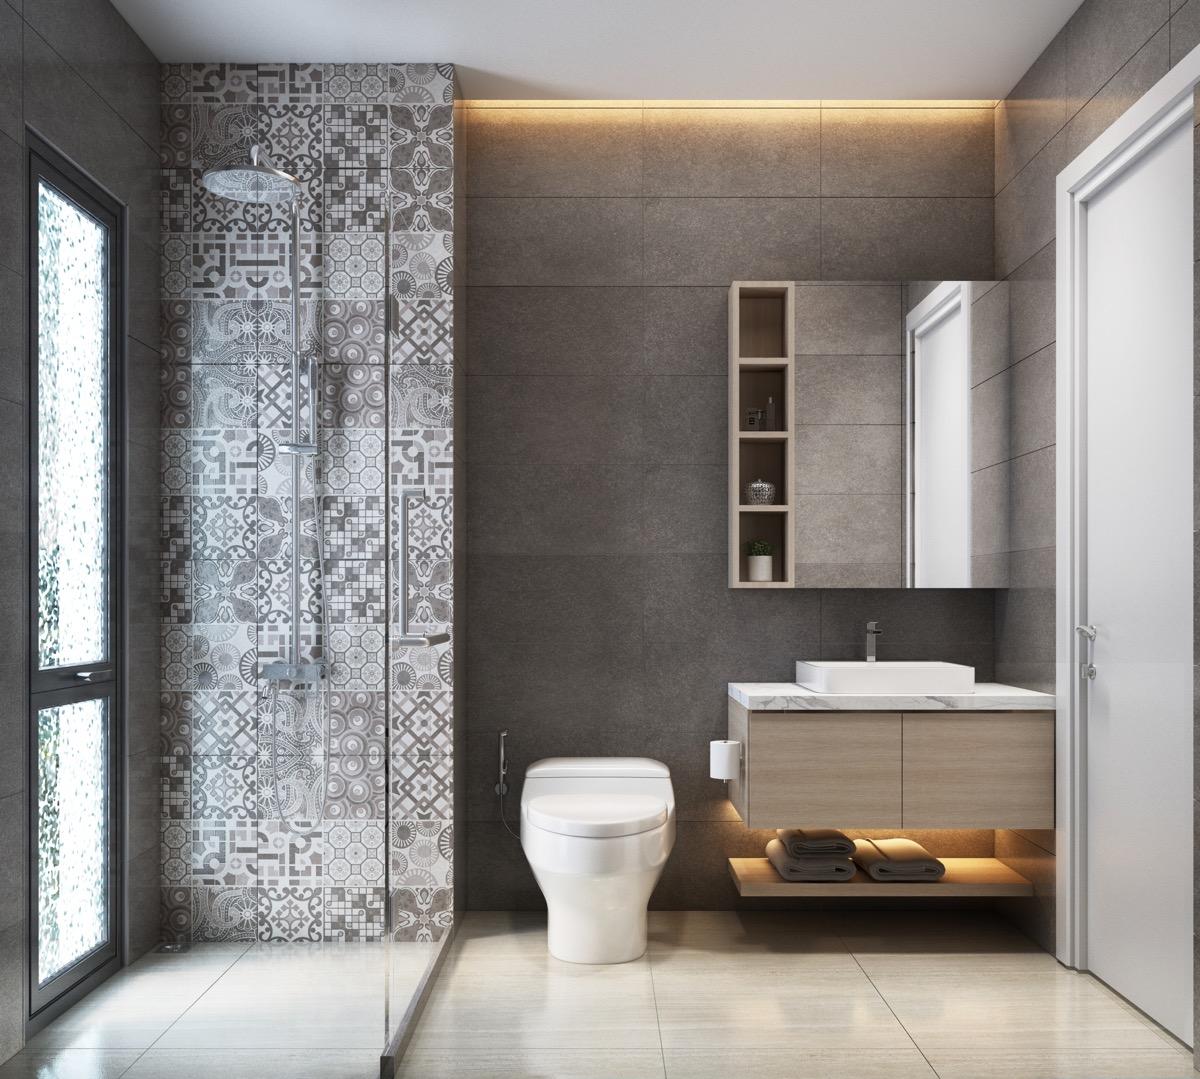 grey-and-white-bathroom-tile-ideas